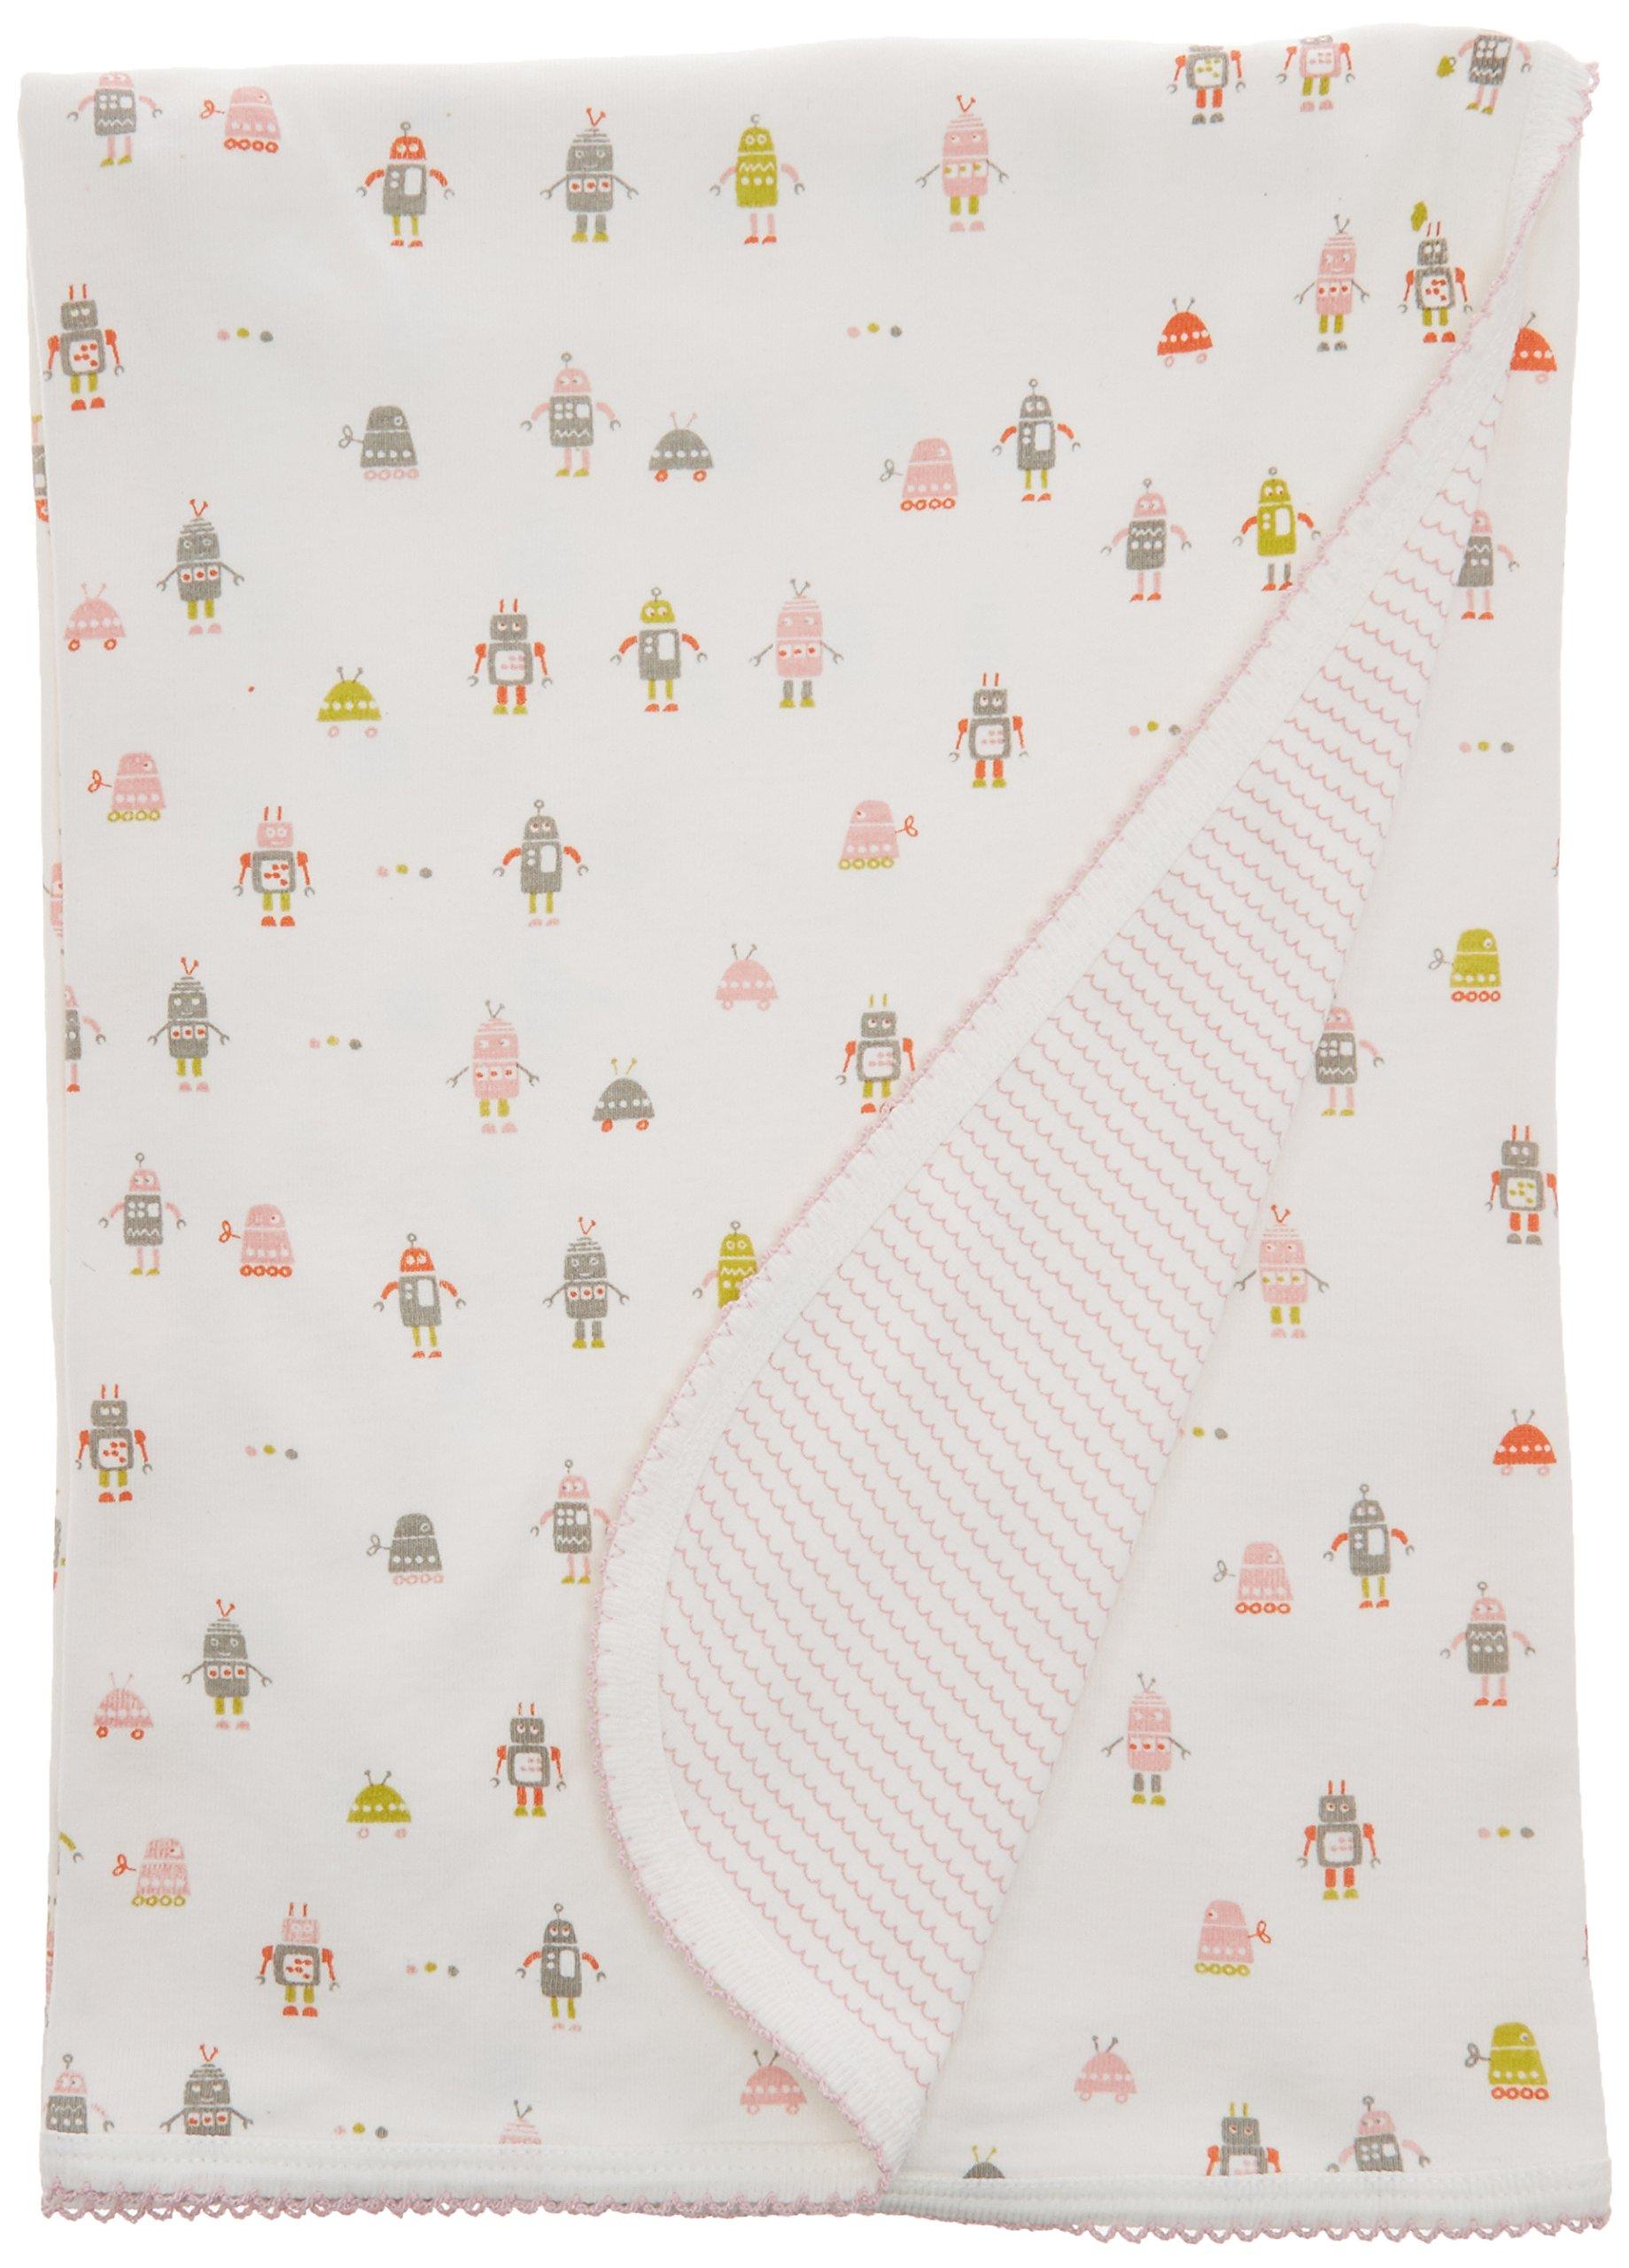 Auggie Robot March Pink Baby Blanket, Pink